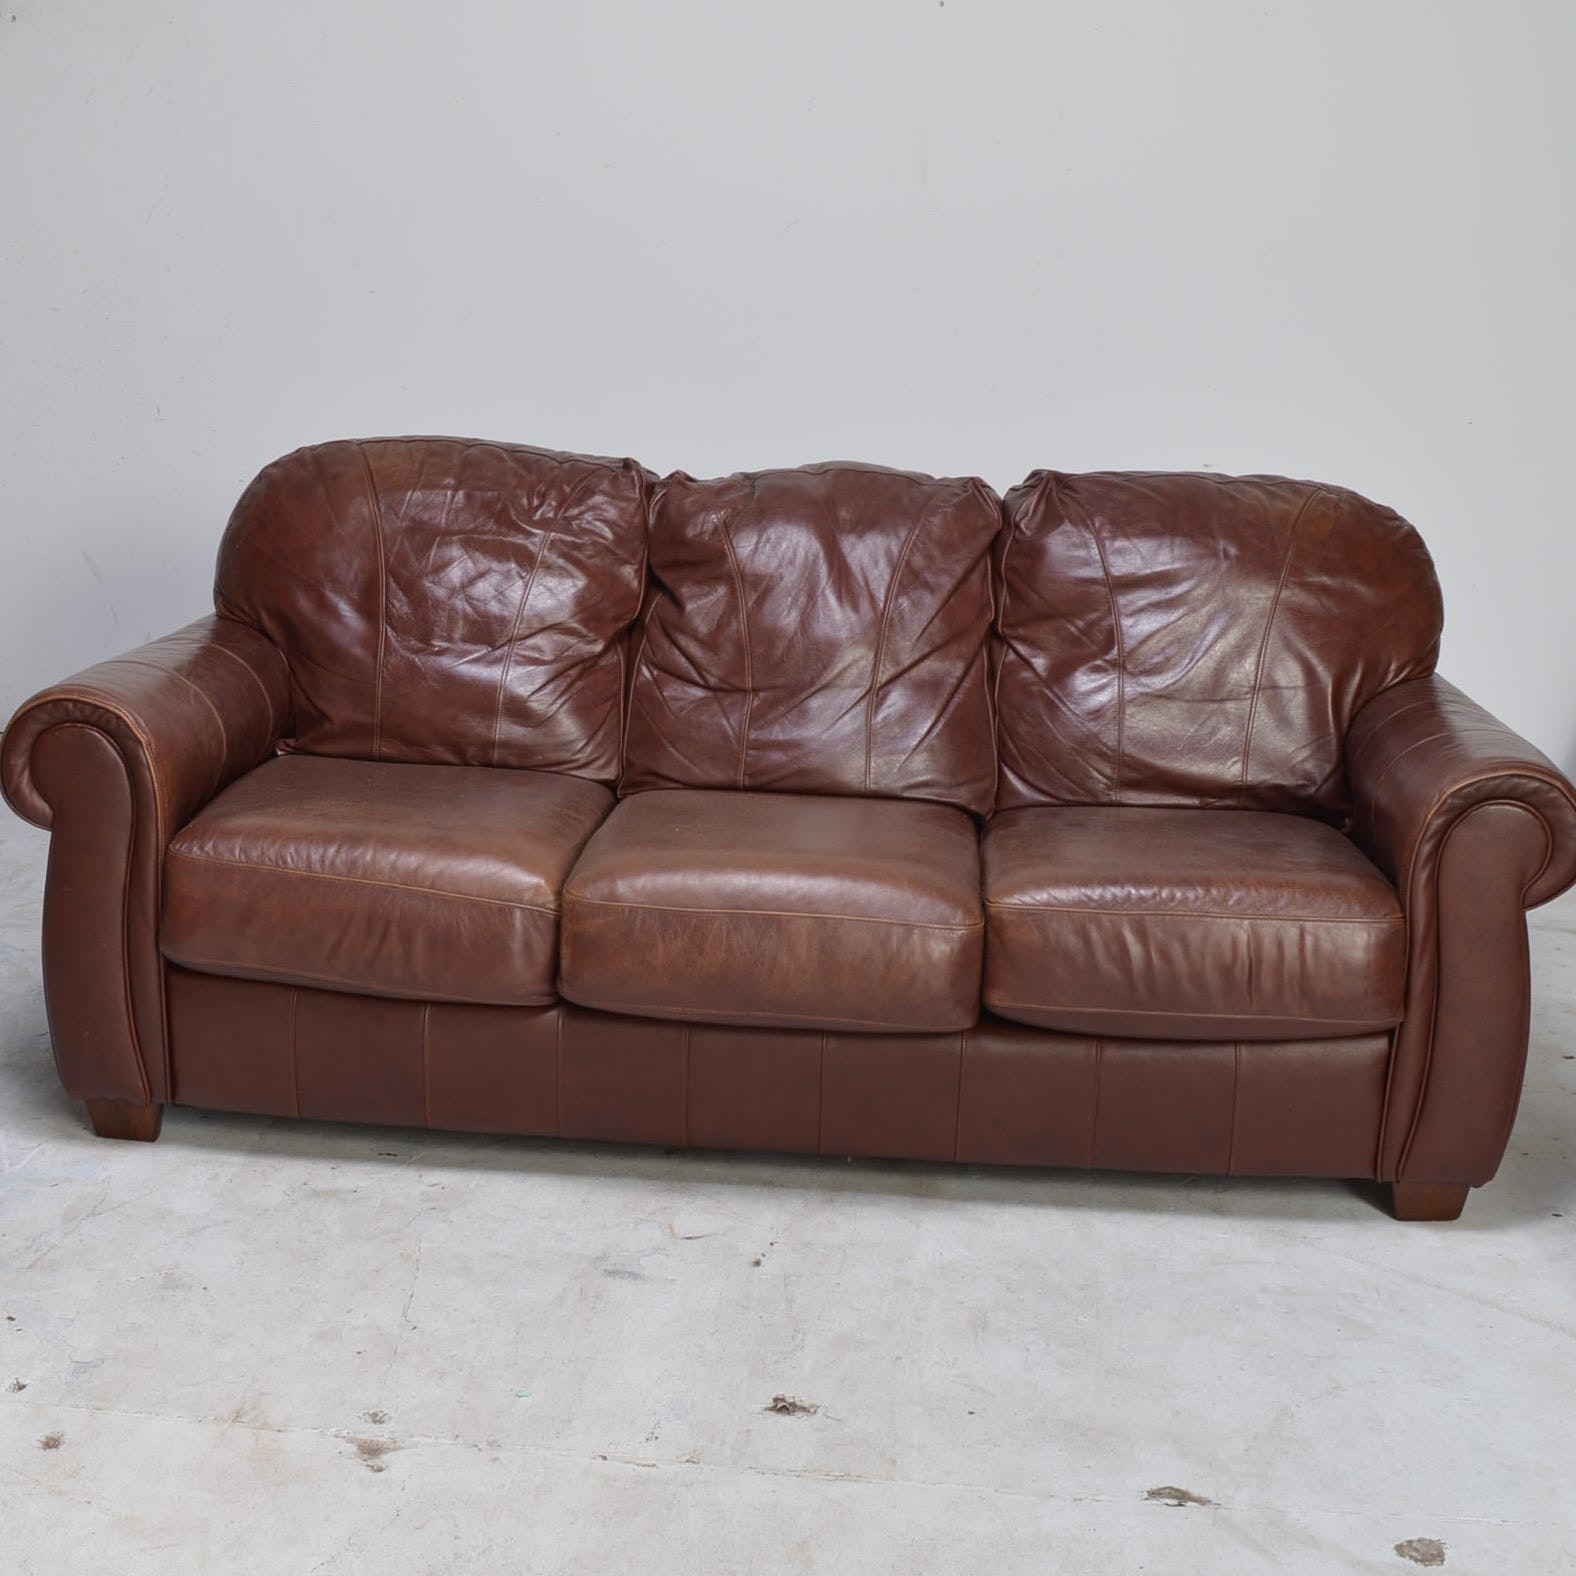 Lane Furniture Leather Sofa or Loveseat